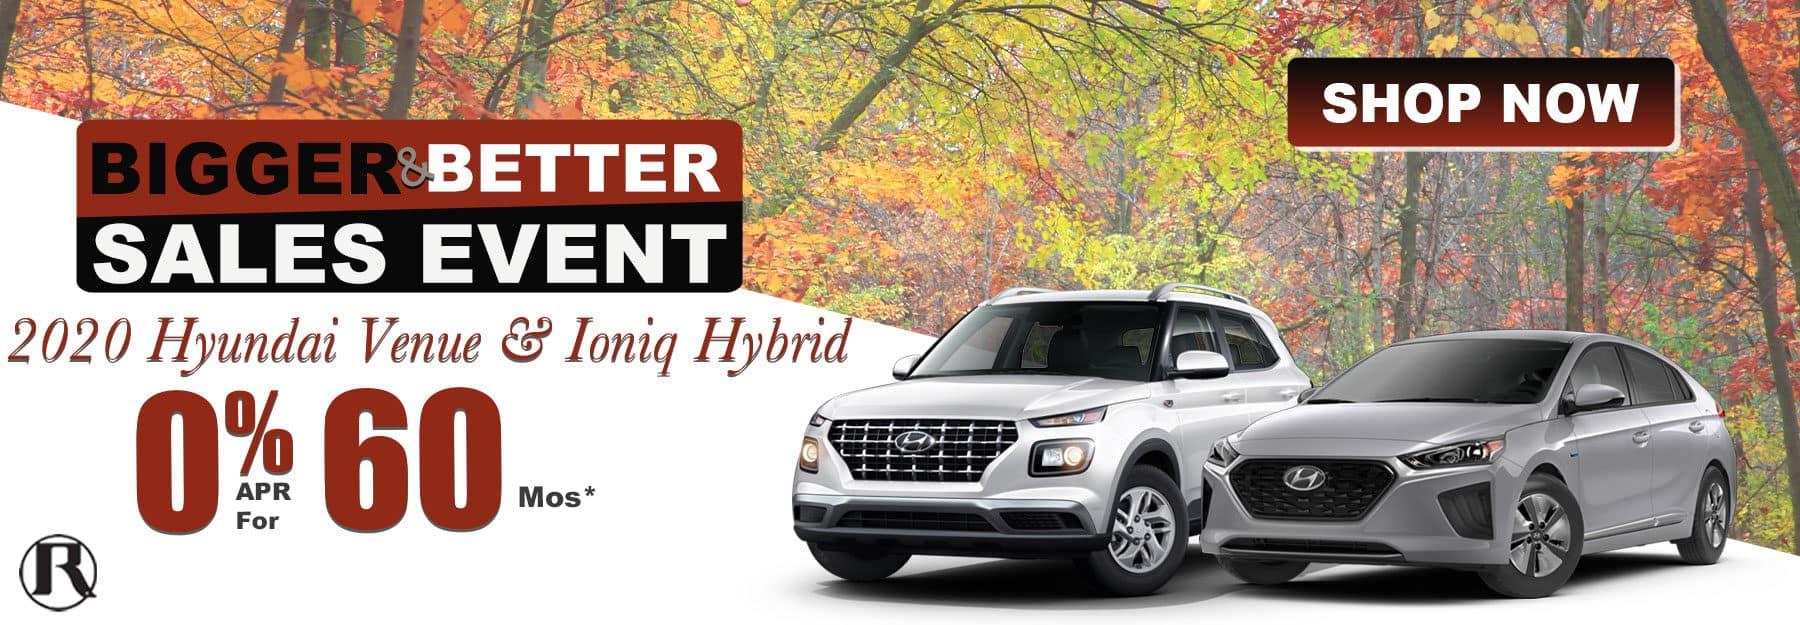 2020 Hyundai Venue & Ioniq Hybrid